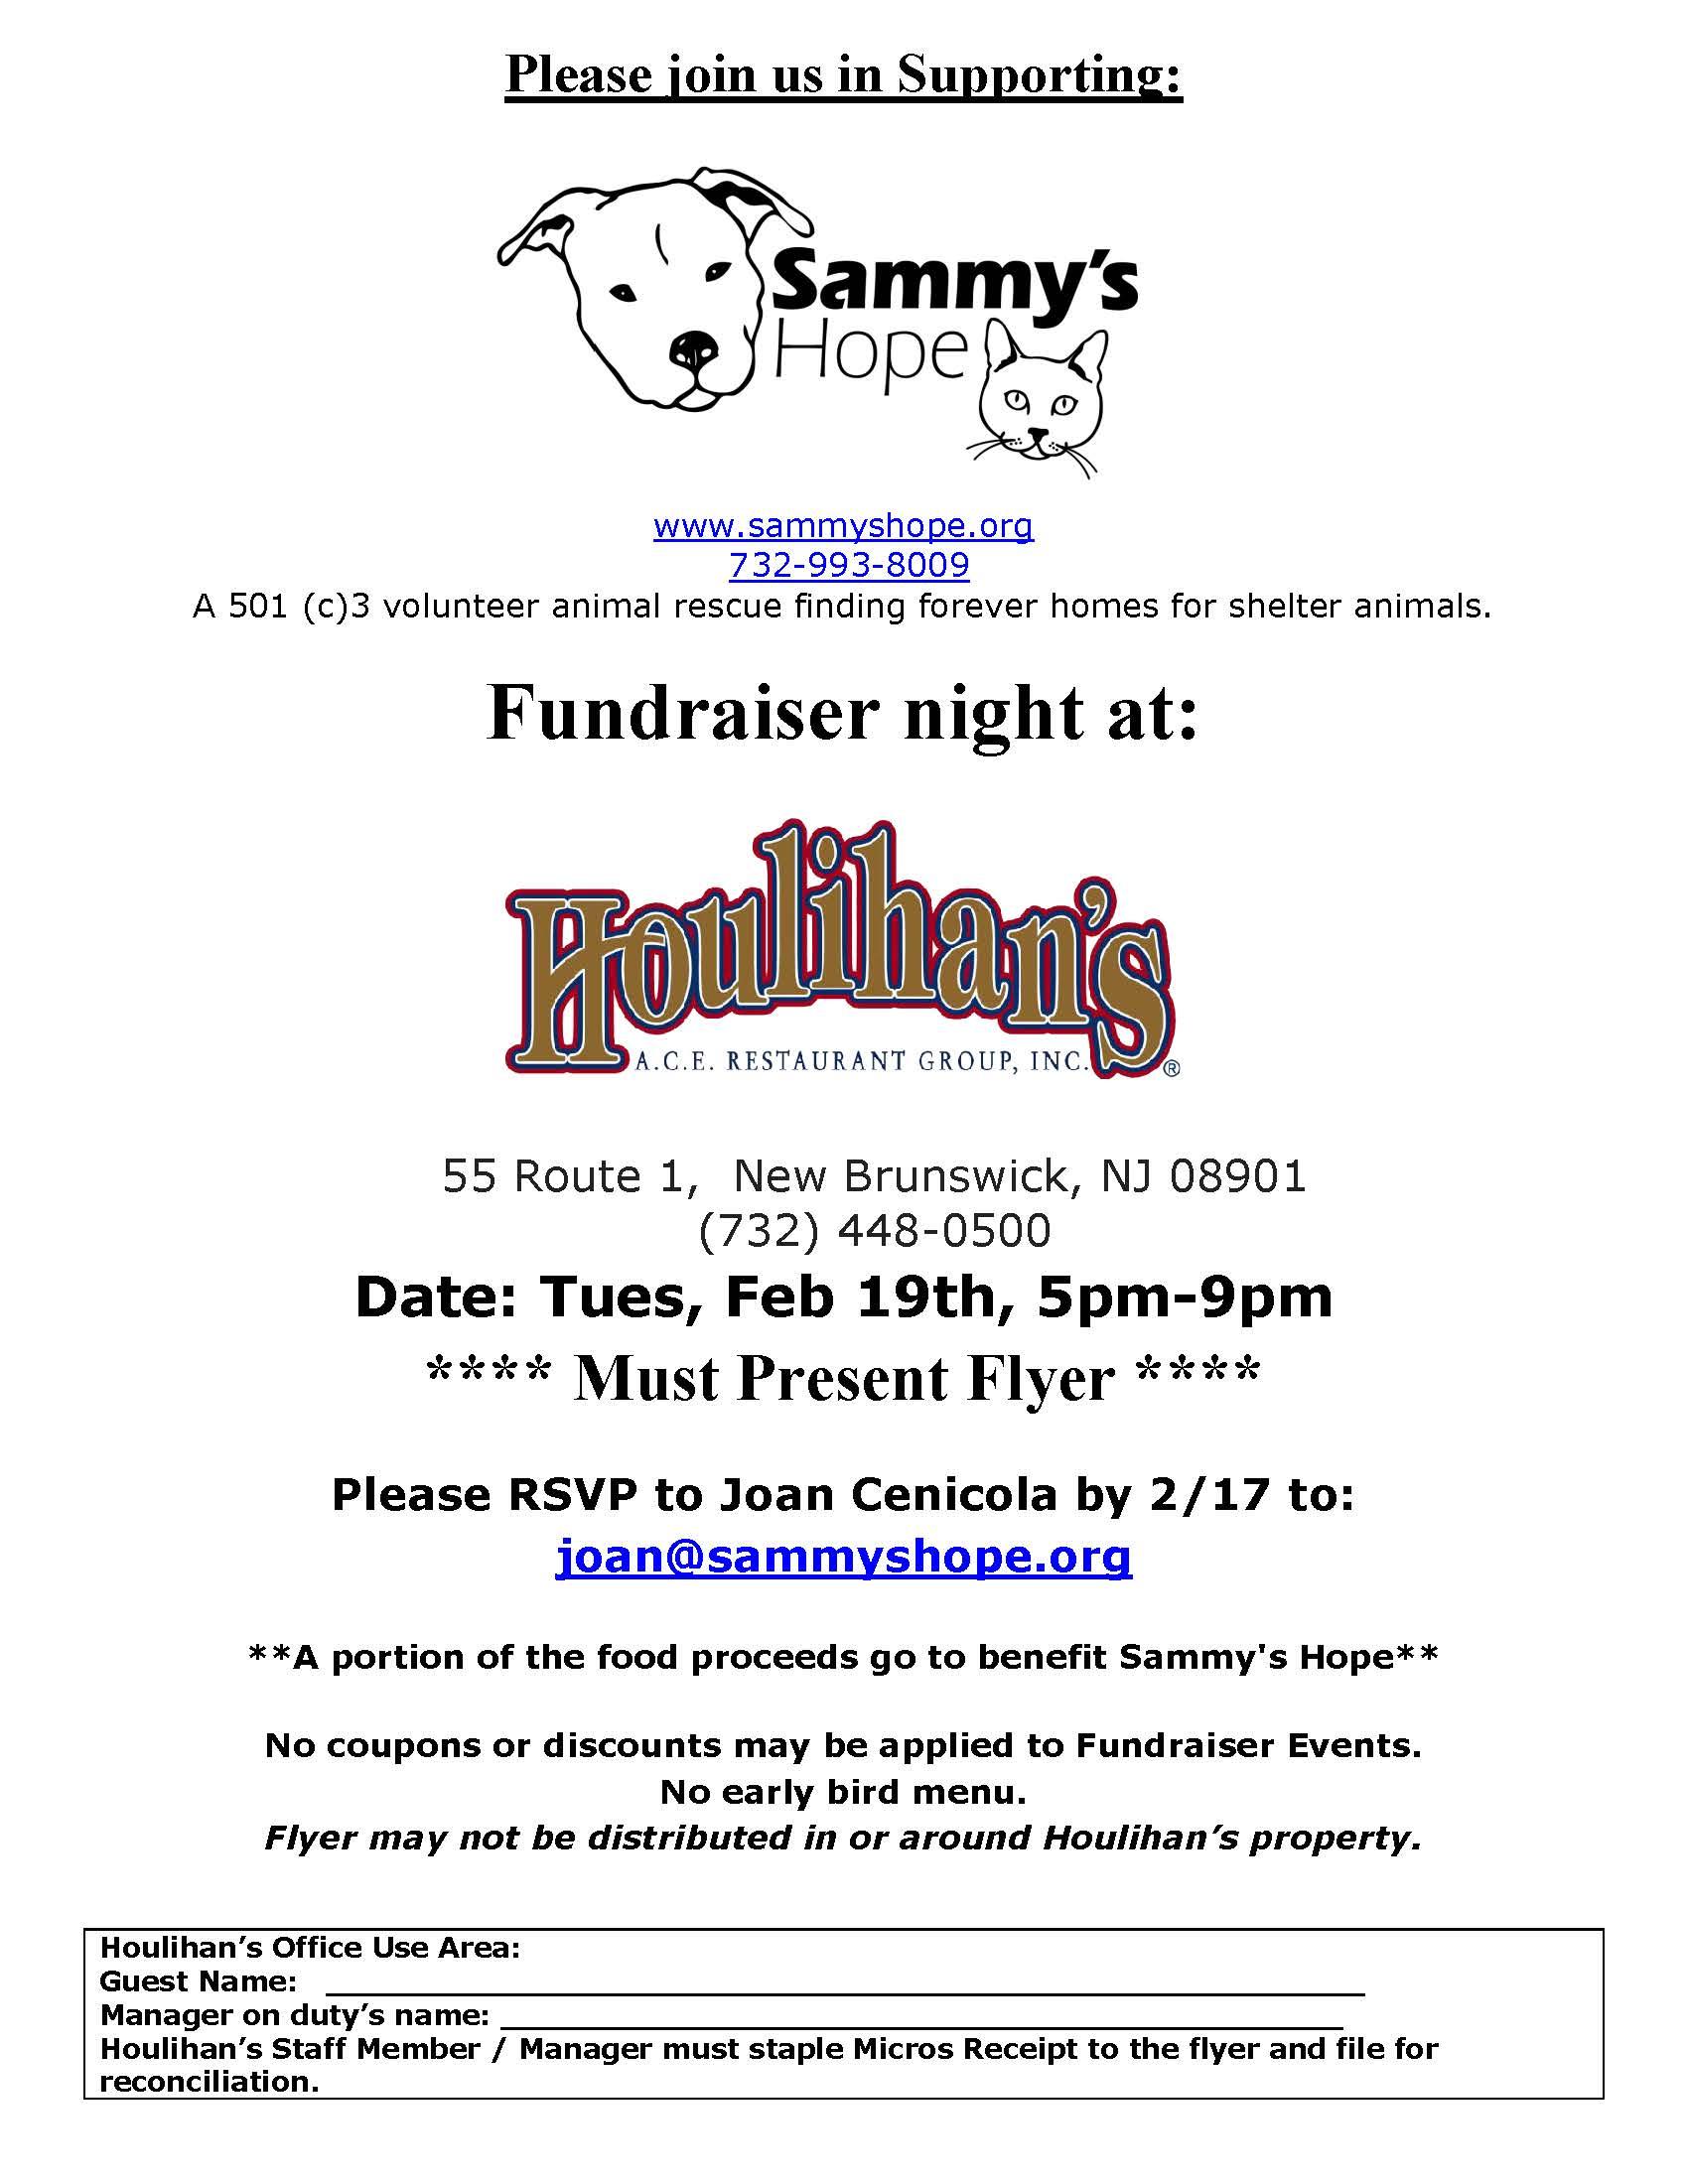 SammysHopeHoulihansFundraiser2013